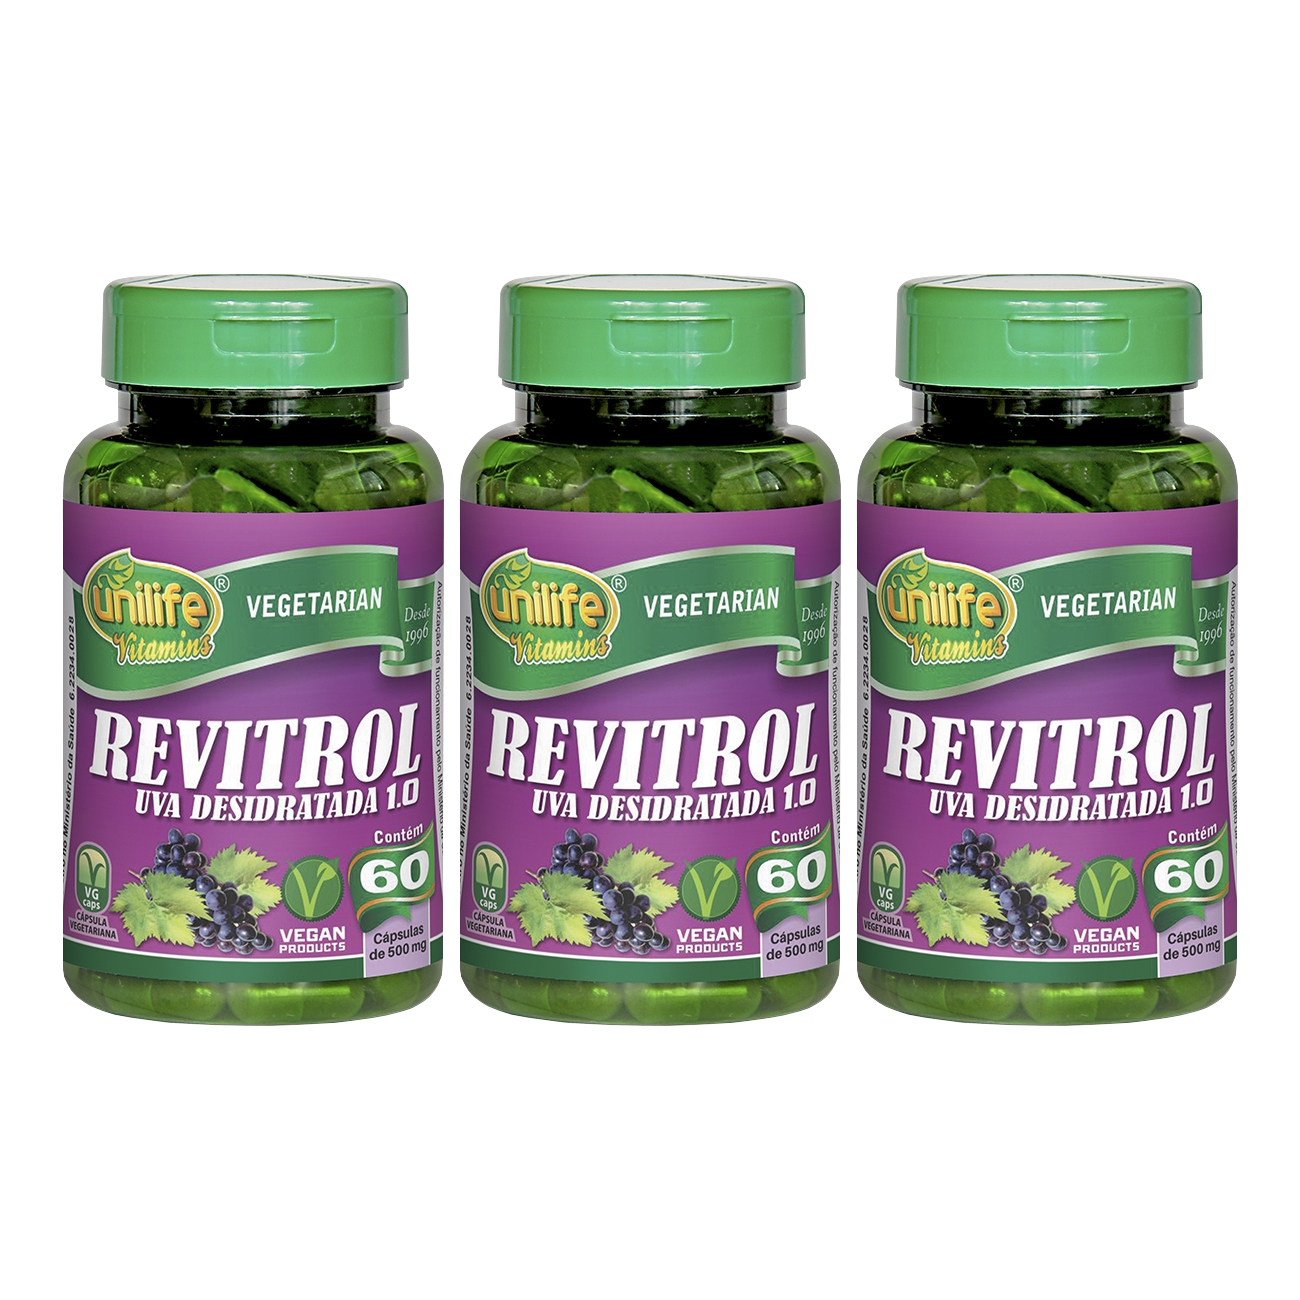 Revitrol Resveratrol Uva Desidratada 60 Cápsulas Unilife Kit 3 Unidades